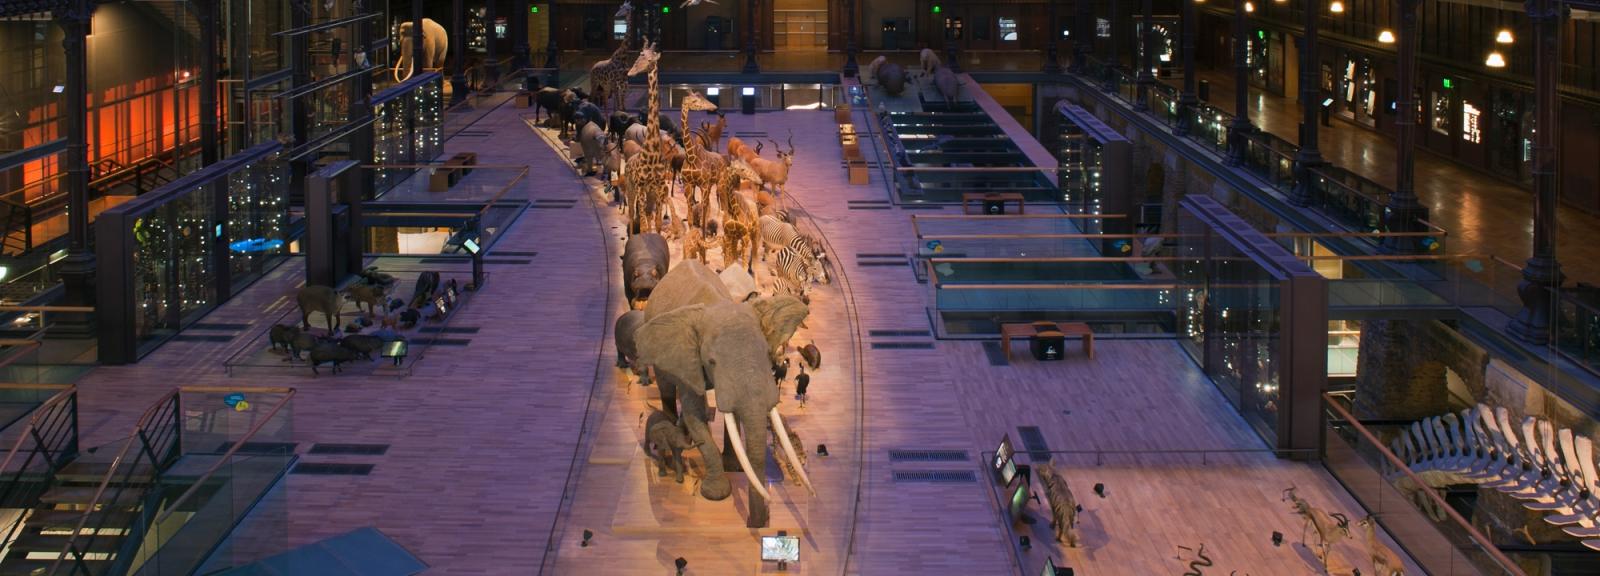 Grande Galerie de l'Évolution : caravane africaine © MNHN – Agnès Iatzoura